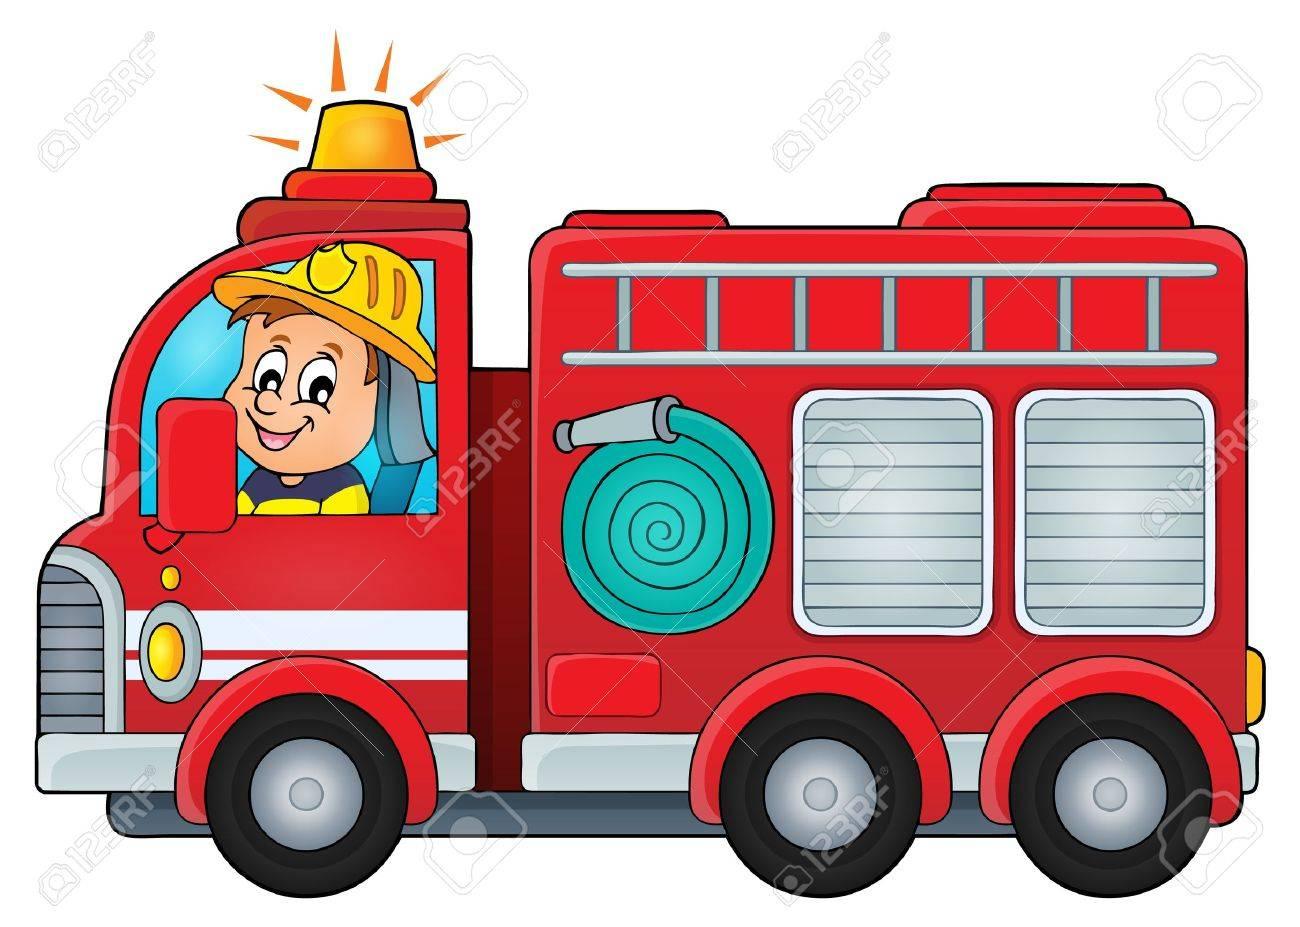 fire truck theme image vector illustration royalty free cliparts rh 123rf com fire truck clip art free downloads fire truck clip art free download